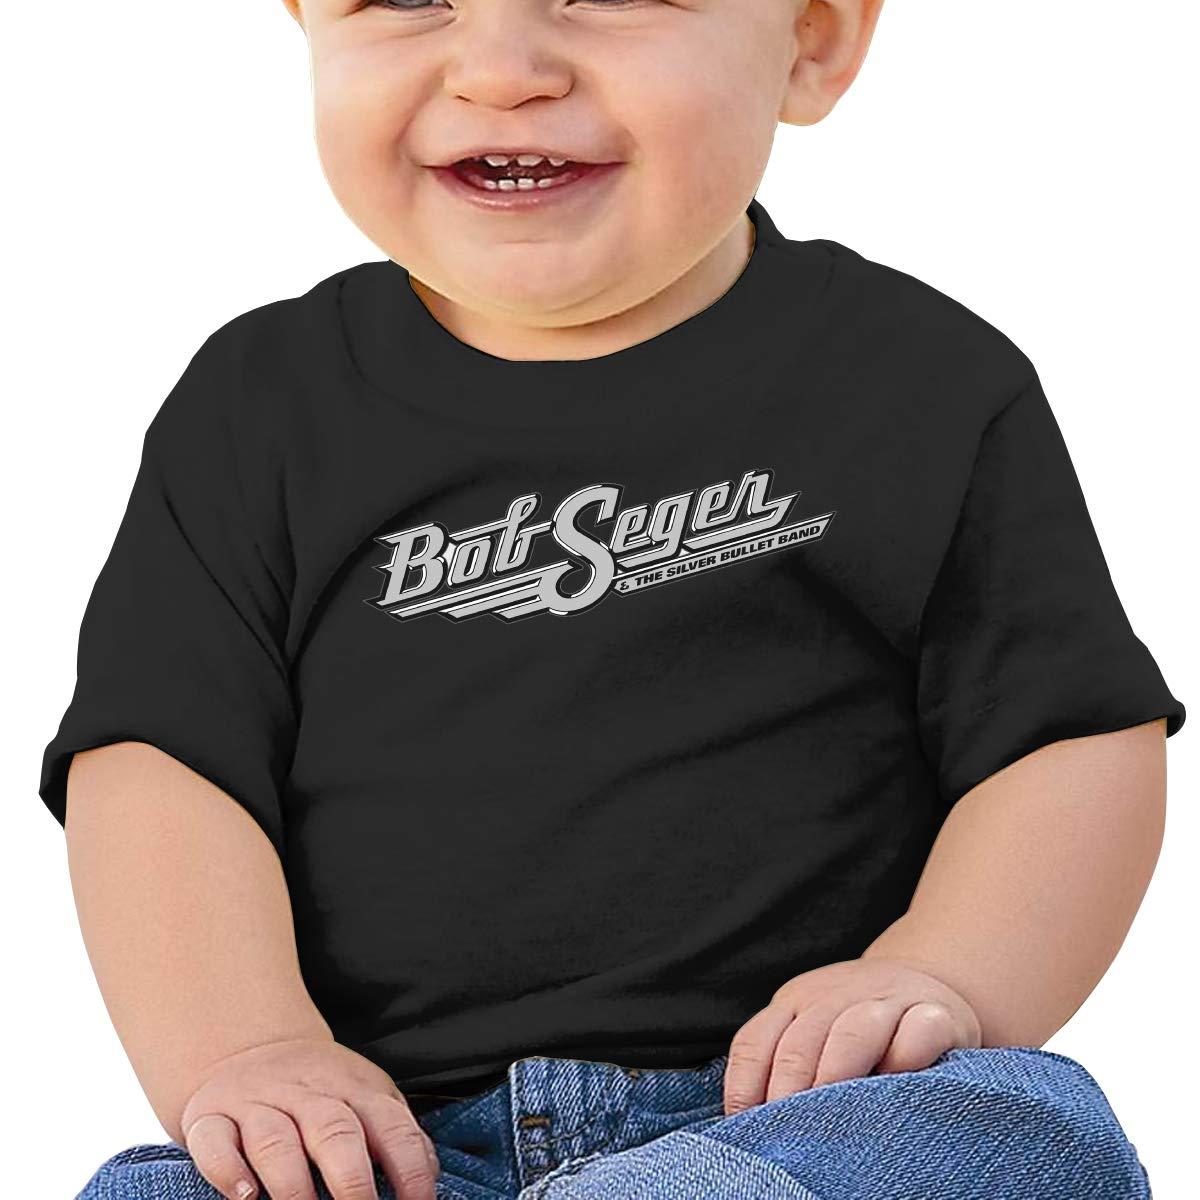 MONIKAL Unisex Infant Short Sleeve T-Shirt Bob-Seger-The-Silver-Bullet Toddler Kids Organic Cotton Graphic Tee Tops